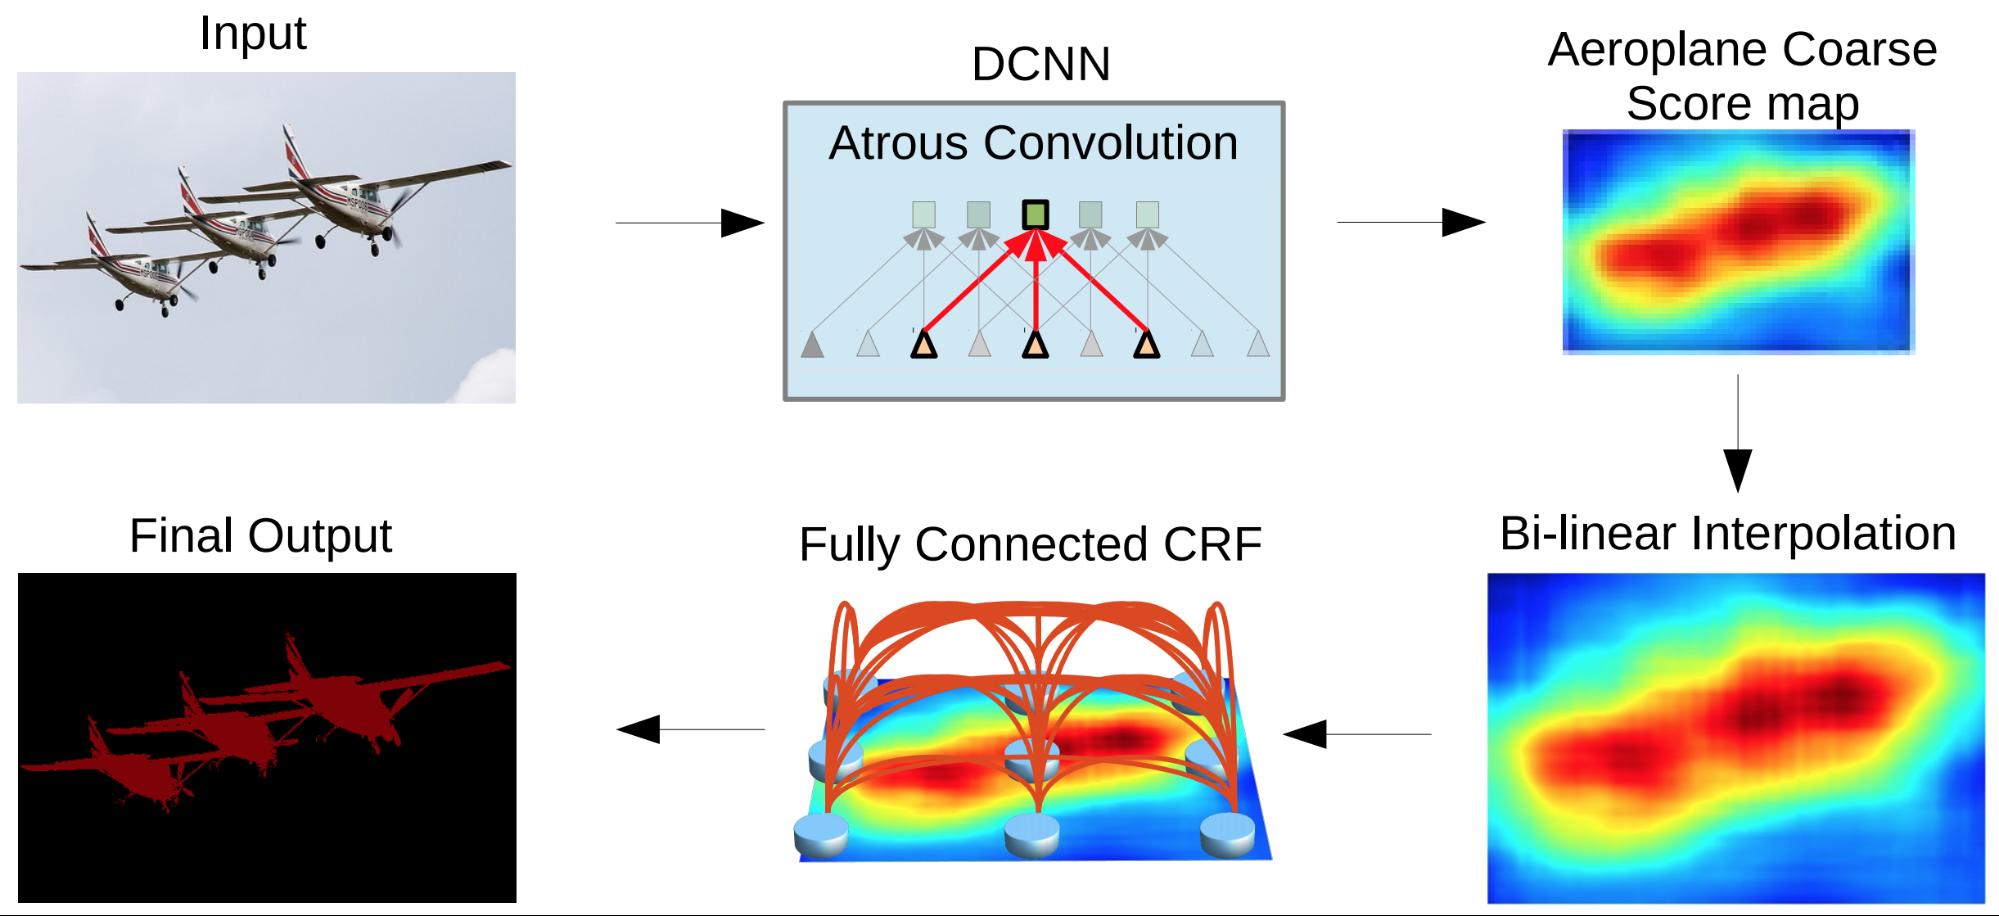 DeepLab2 pipeline for image segmentation